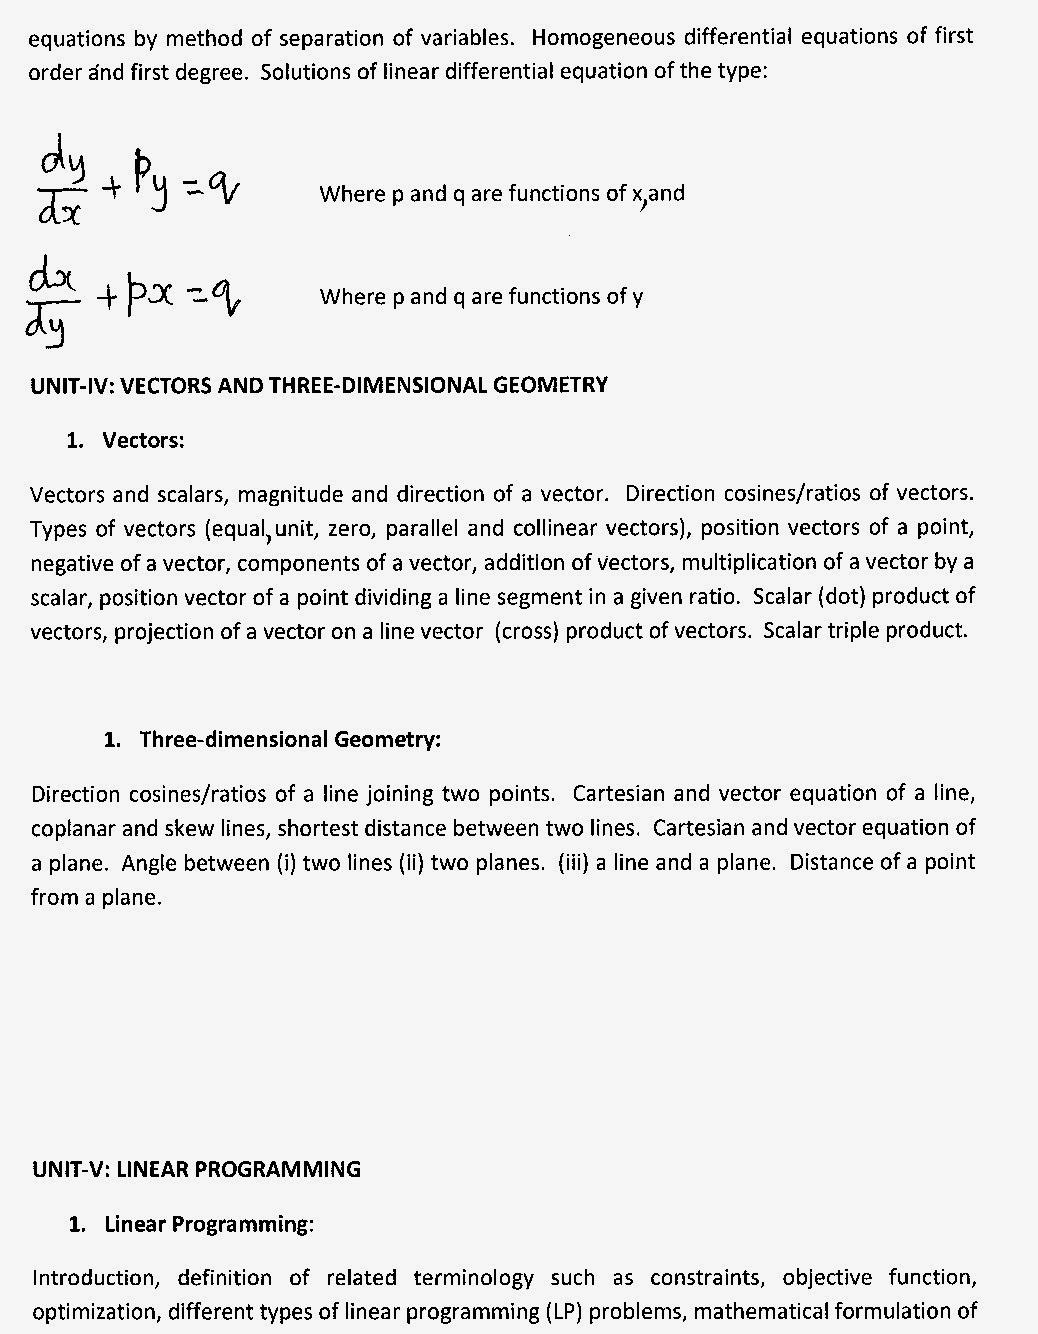 kcet 2014 rank list pdf